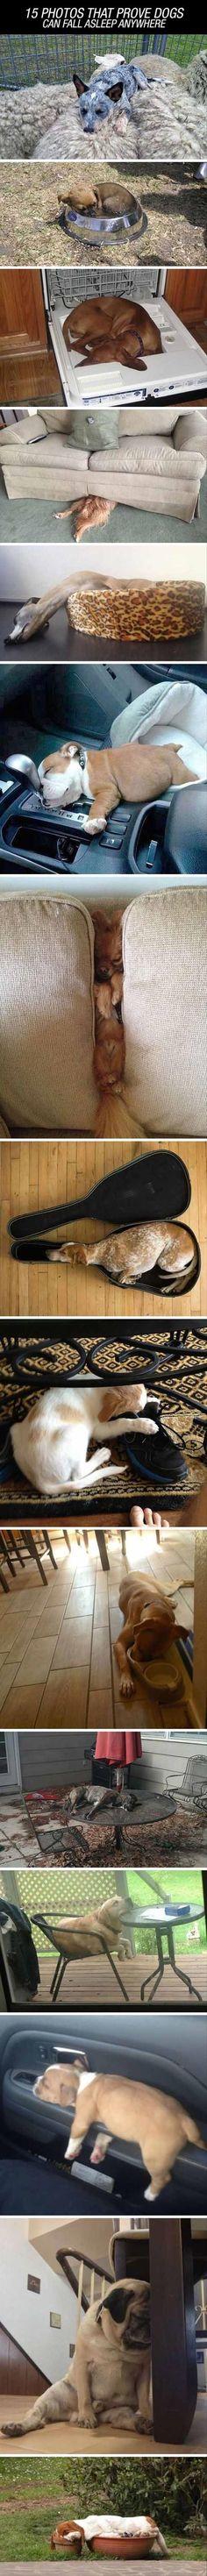 Dogs. Sleeping dogs.